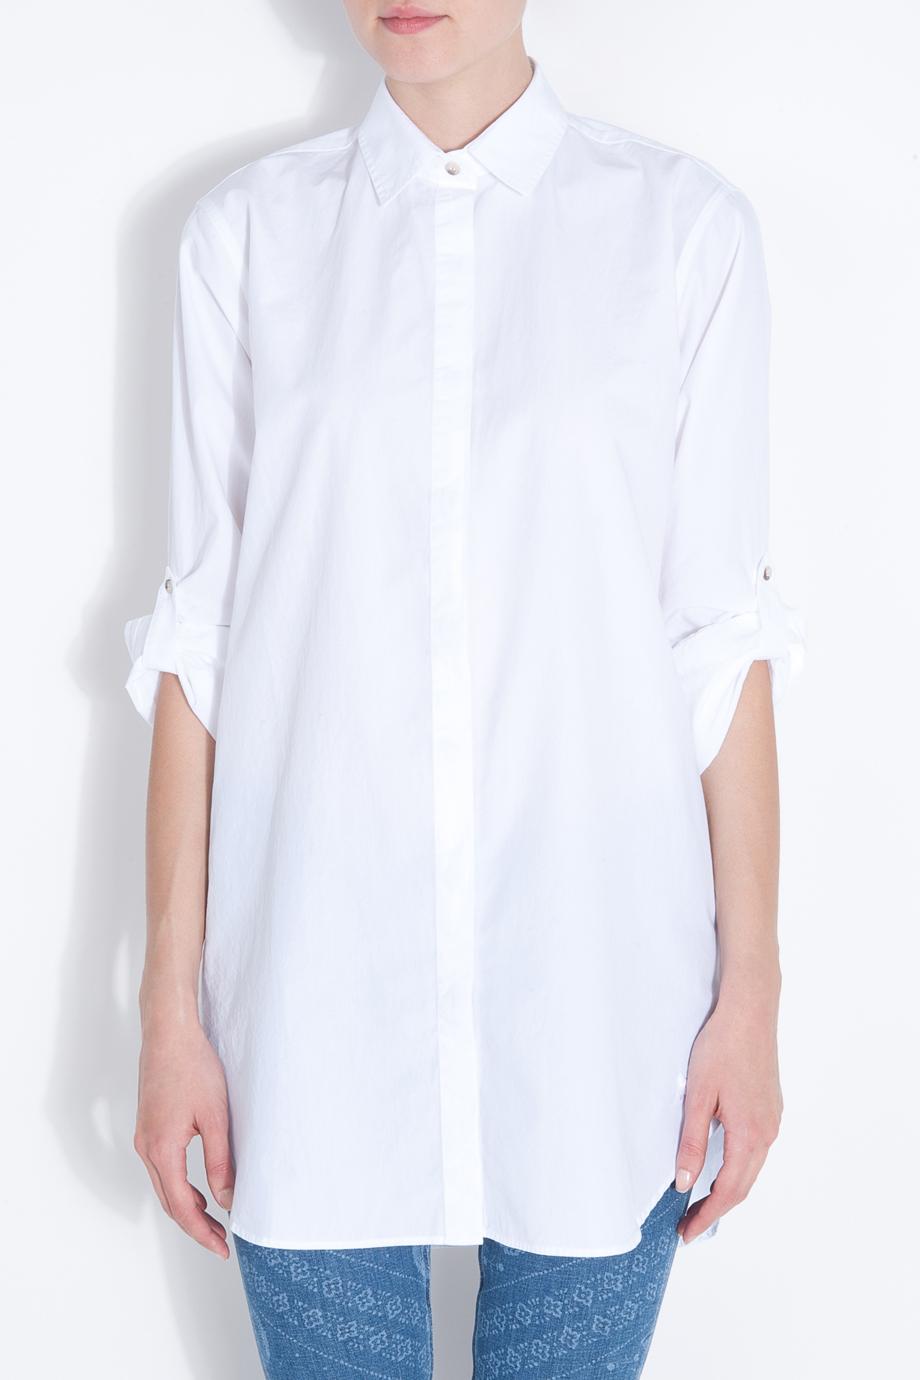 849a711d035da Lyst - M.i.h Jeans Oversize White Shirt in White